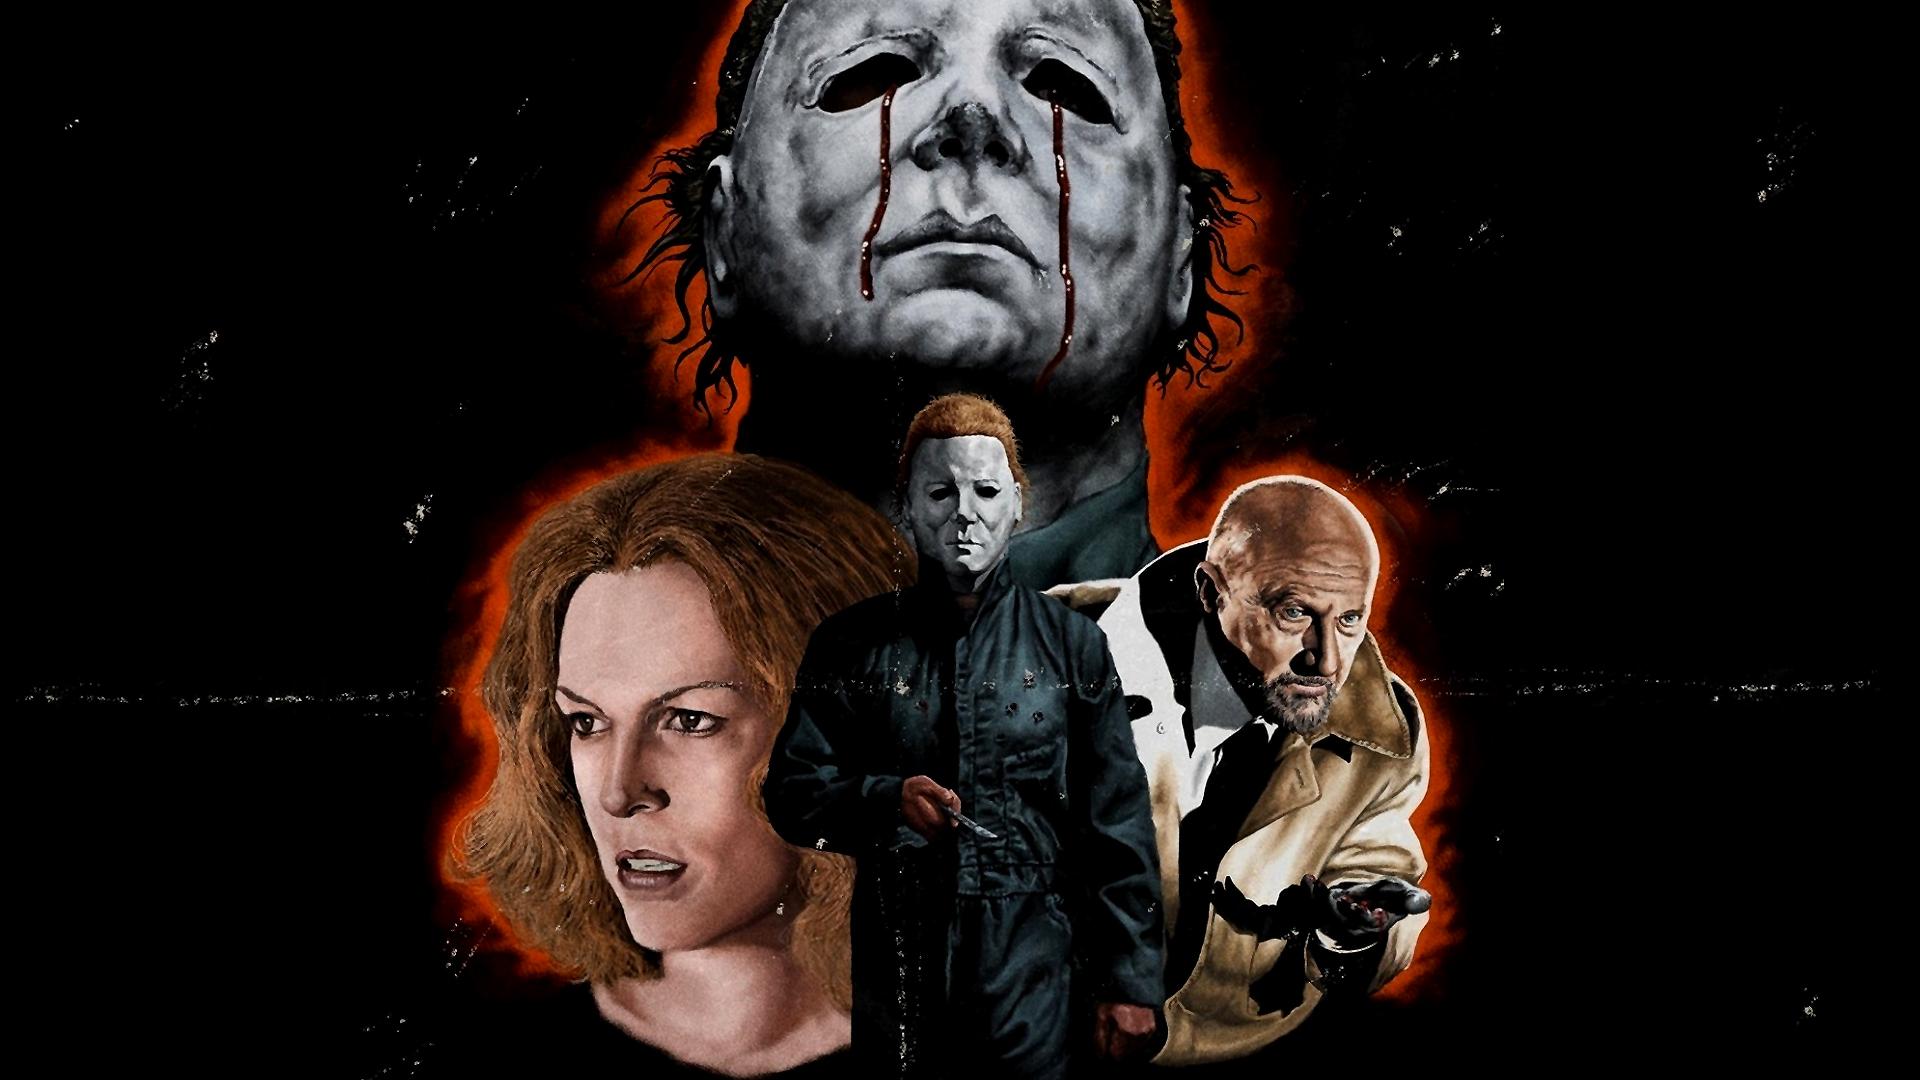 halloween 2 movie wallpaper - photo #2